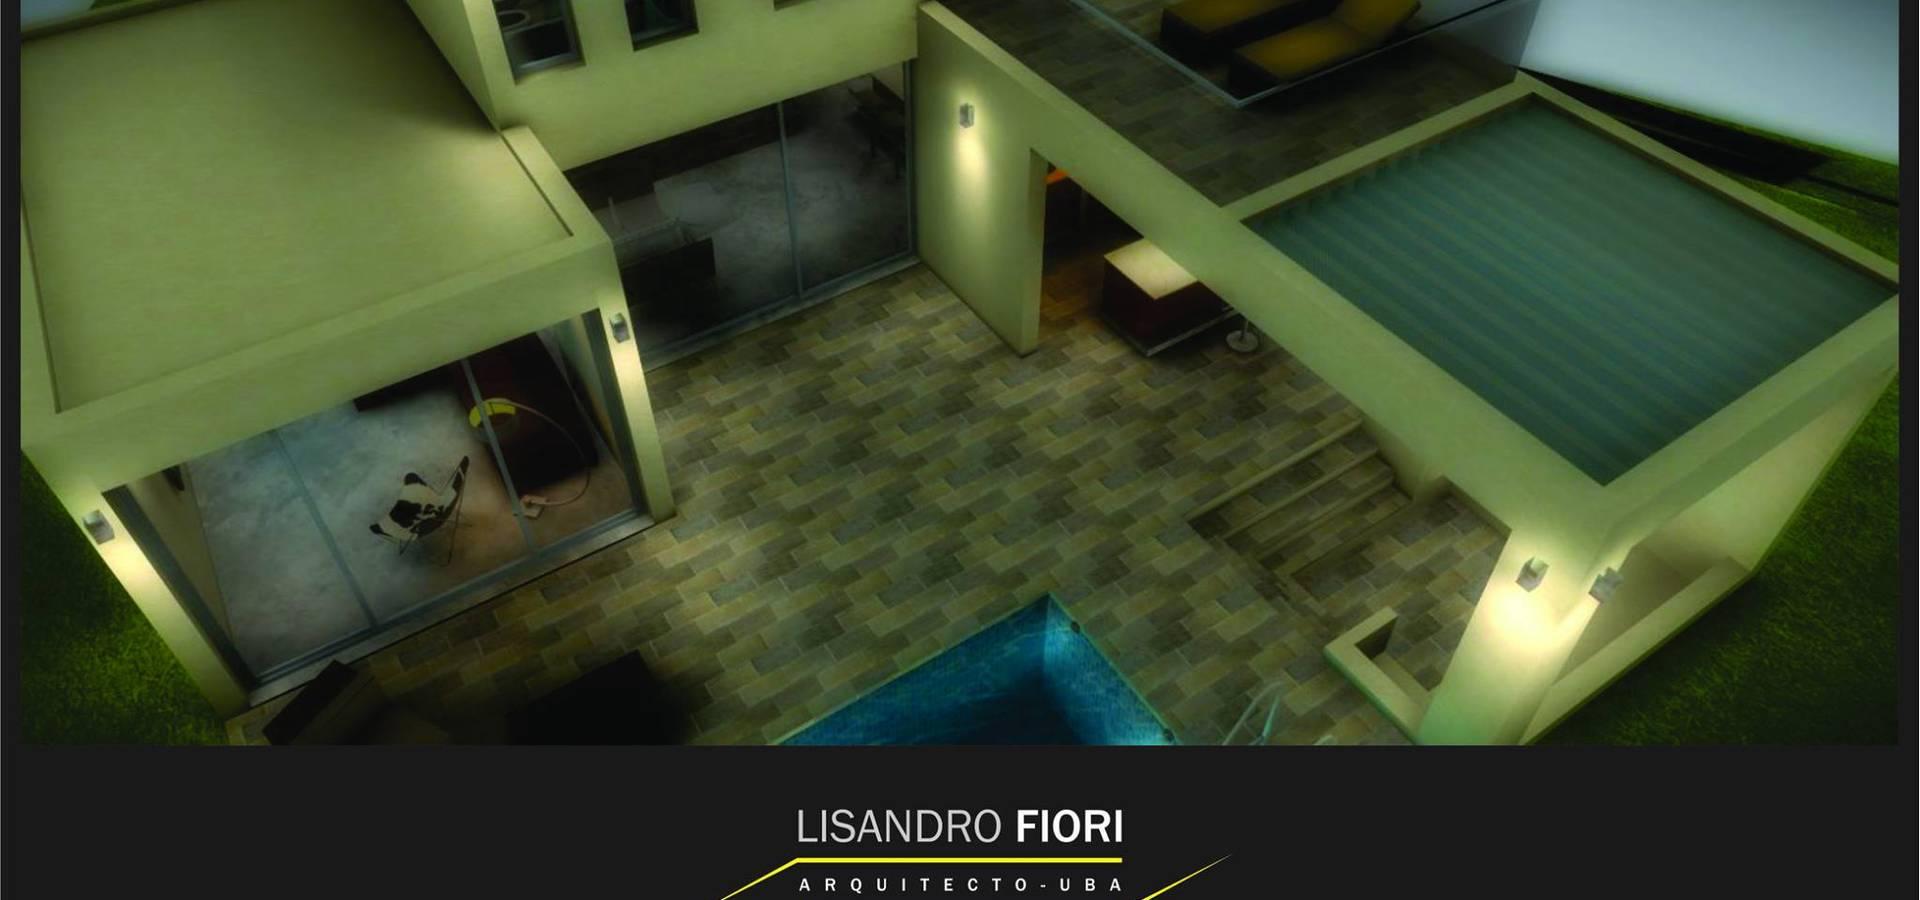 Lisandro Fiori ARQUITECTO